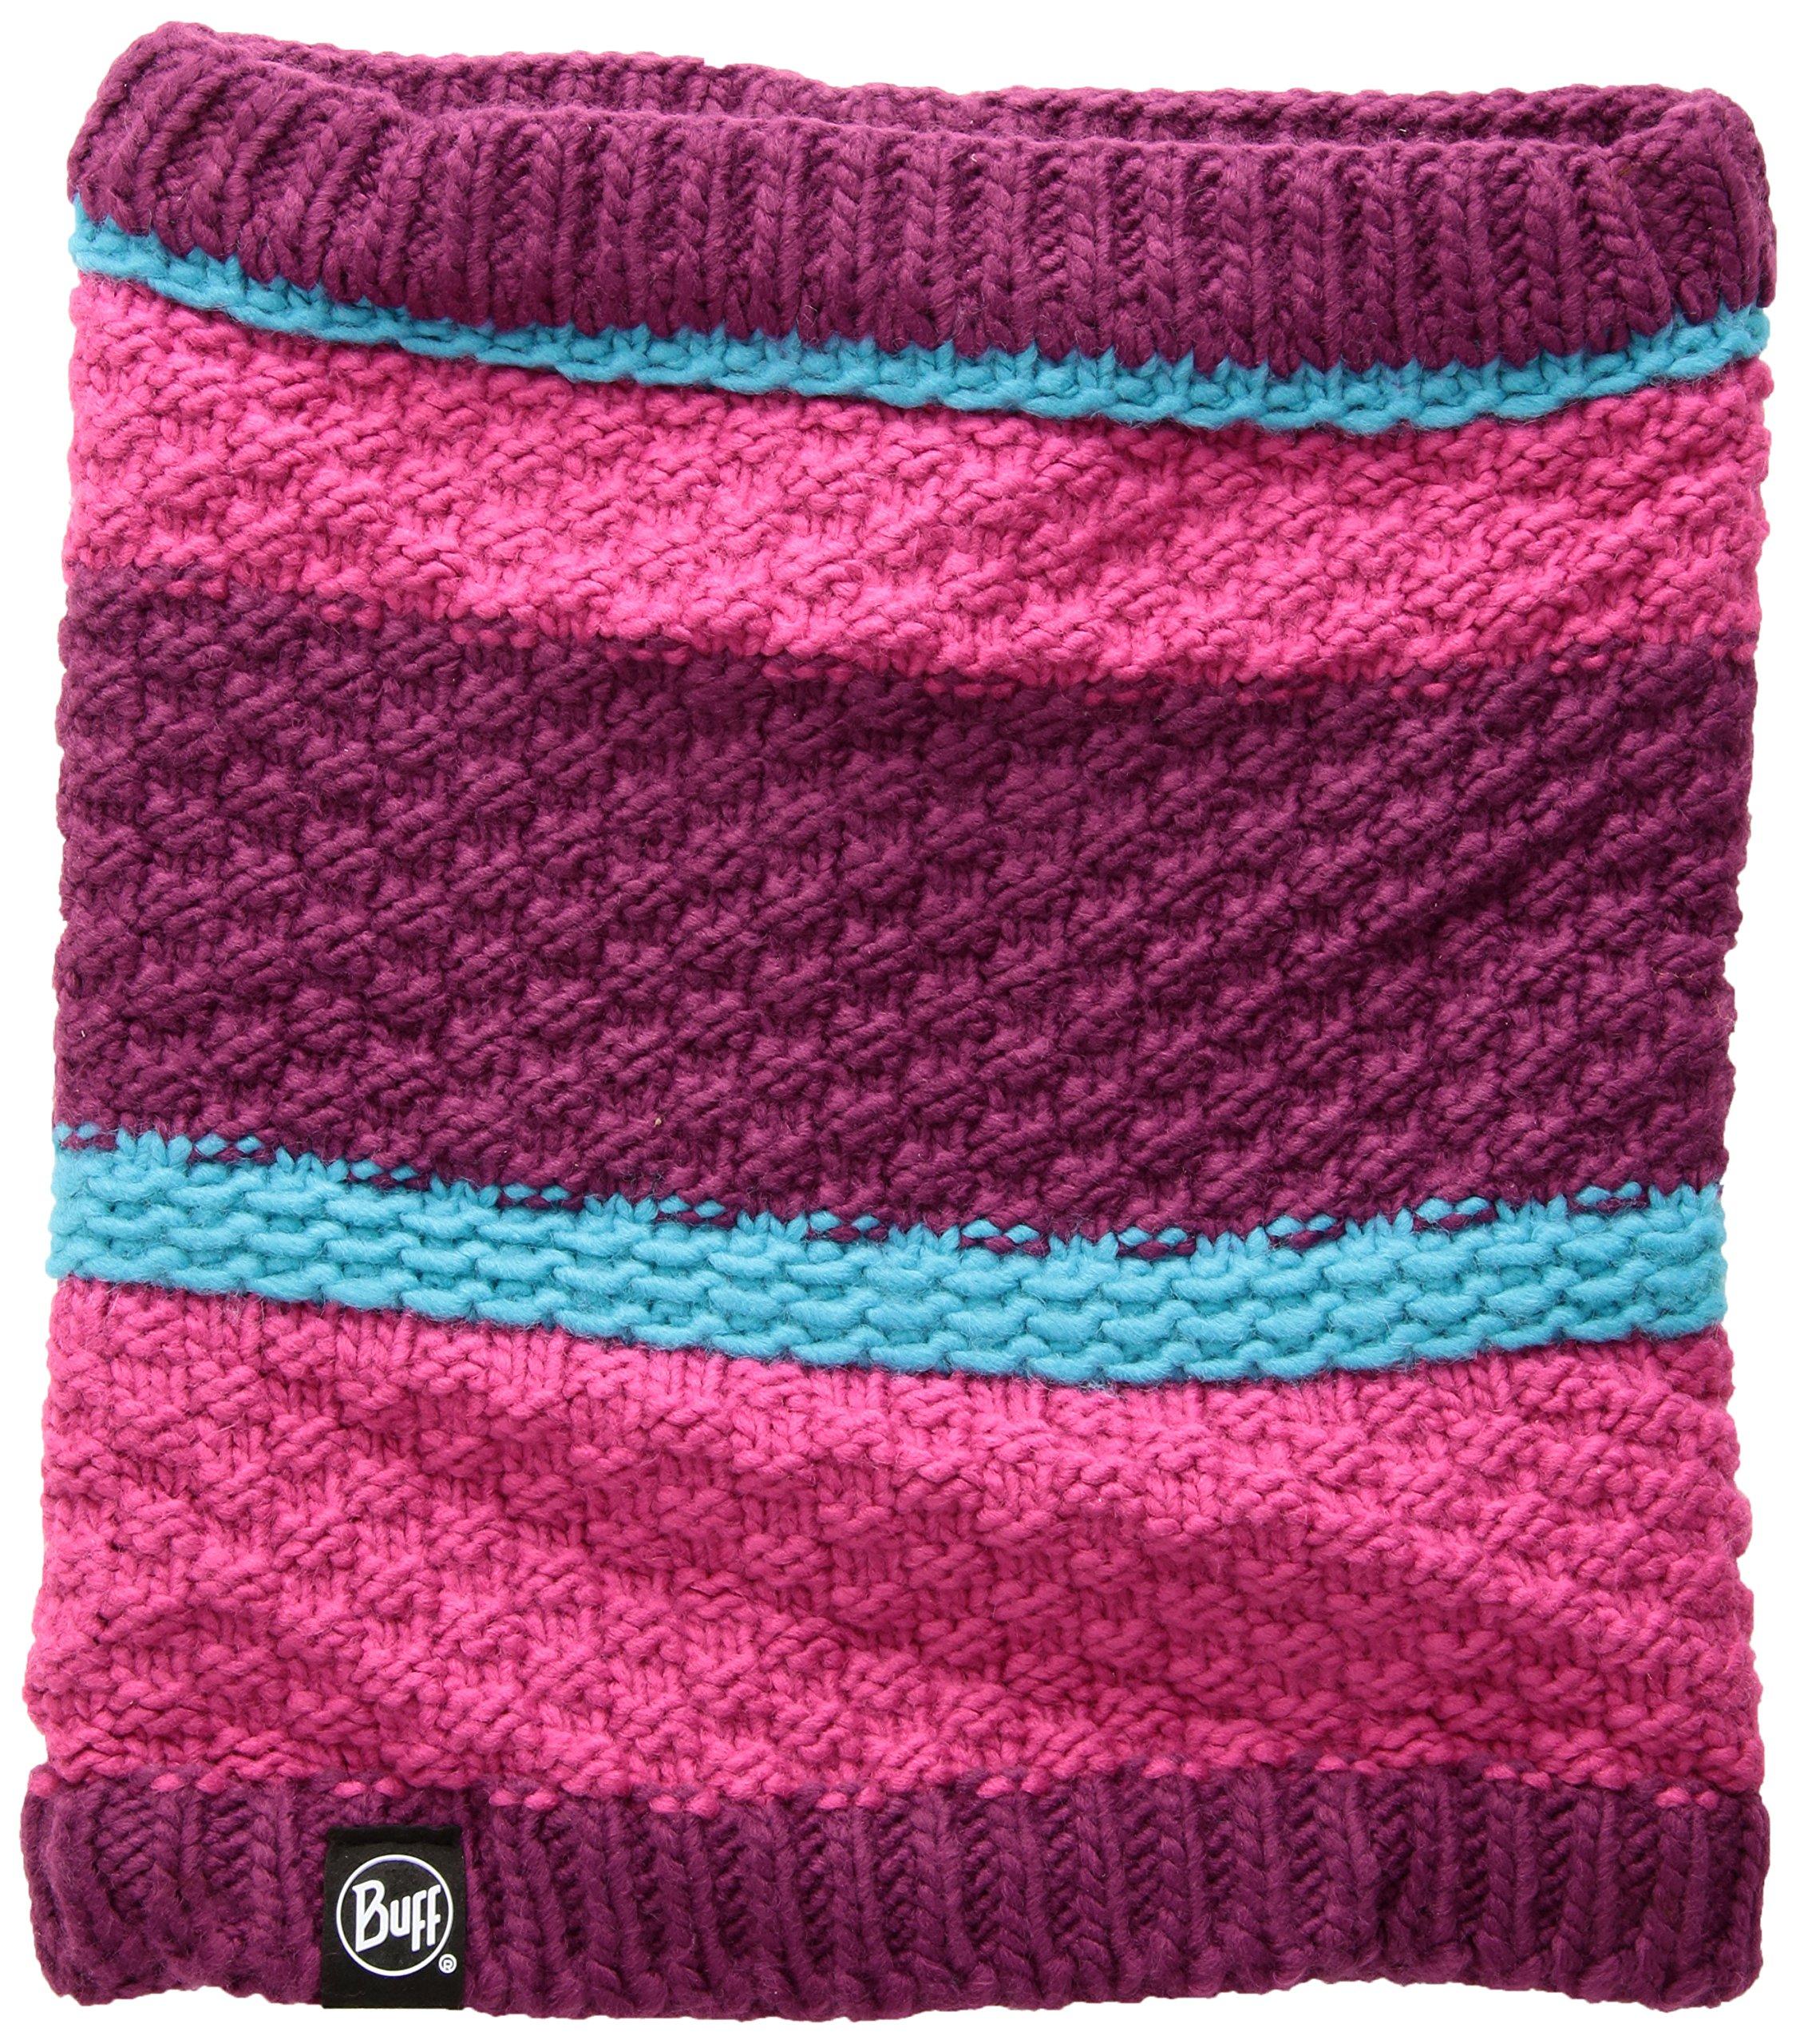 BUFF Fizz Neckwarmer, Pink Honeysuckle, One Size